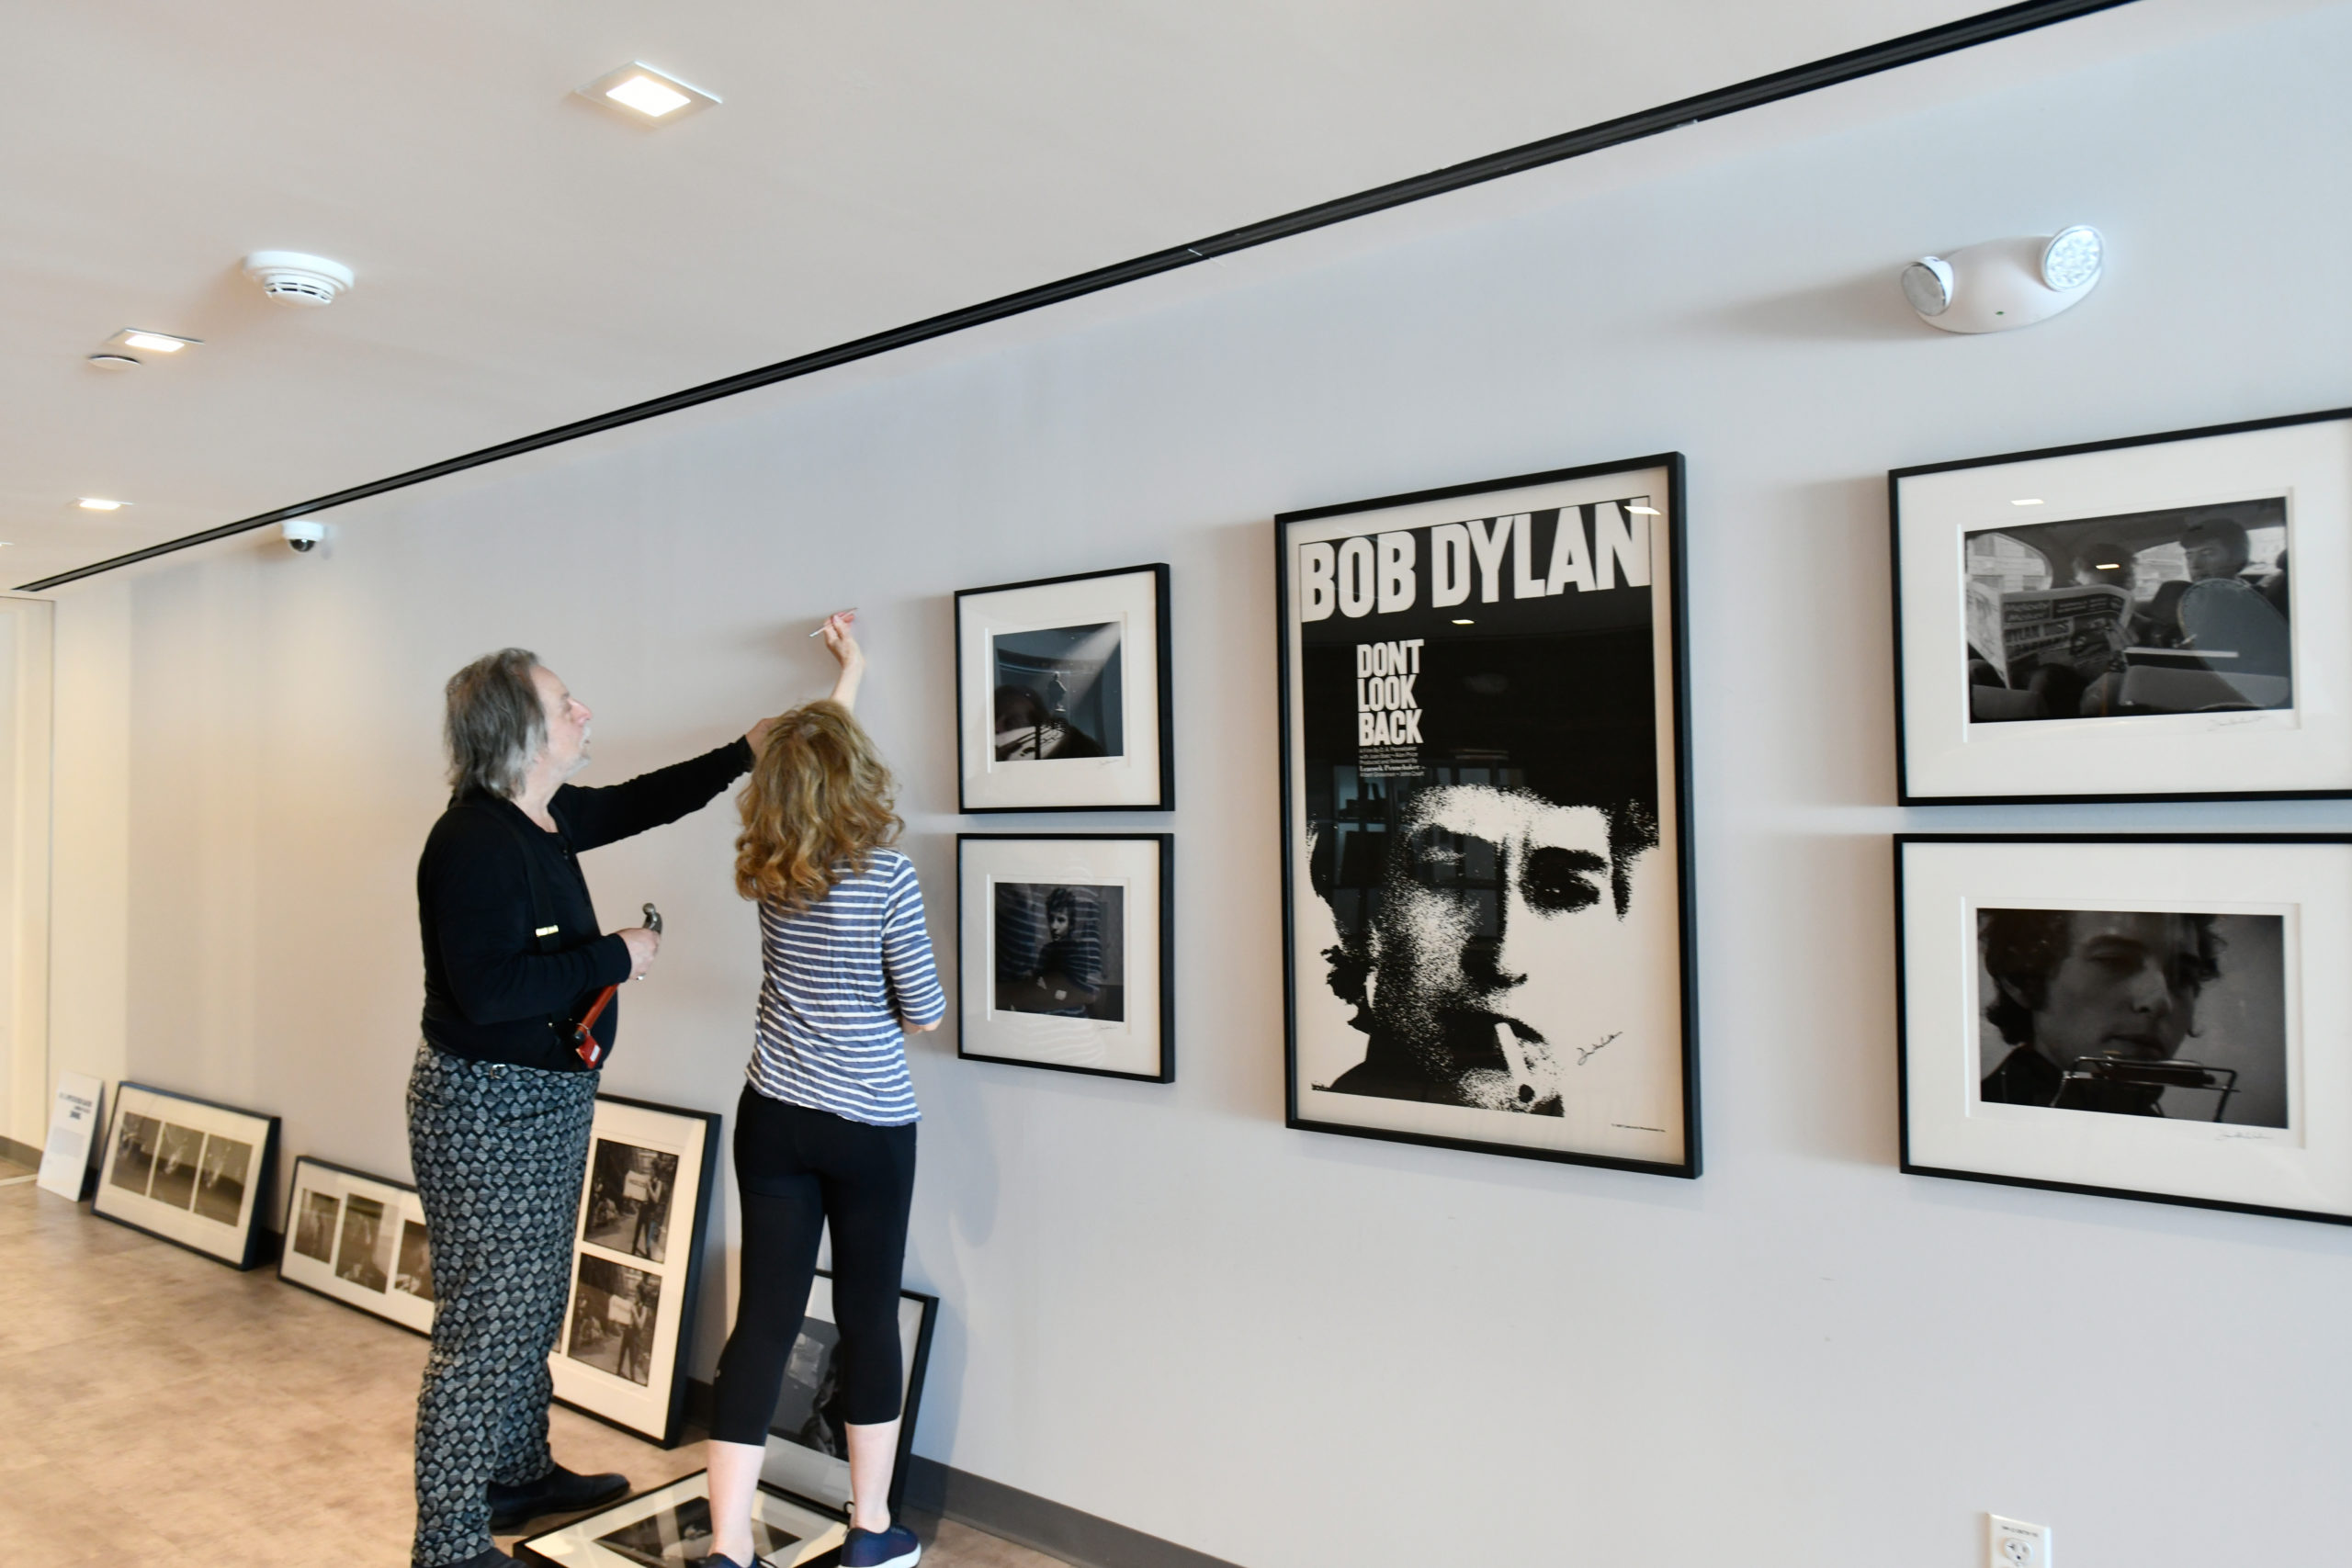 Joseph Baldassare, proprietor of Arthouse 18, and April Gornik hang stills from the film